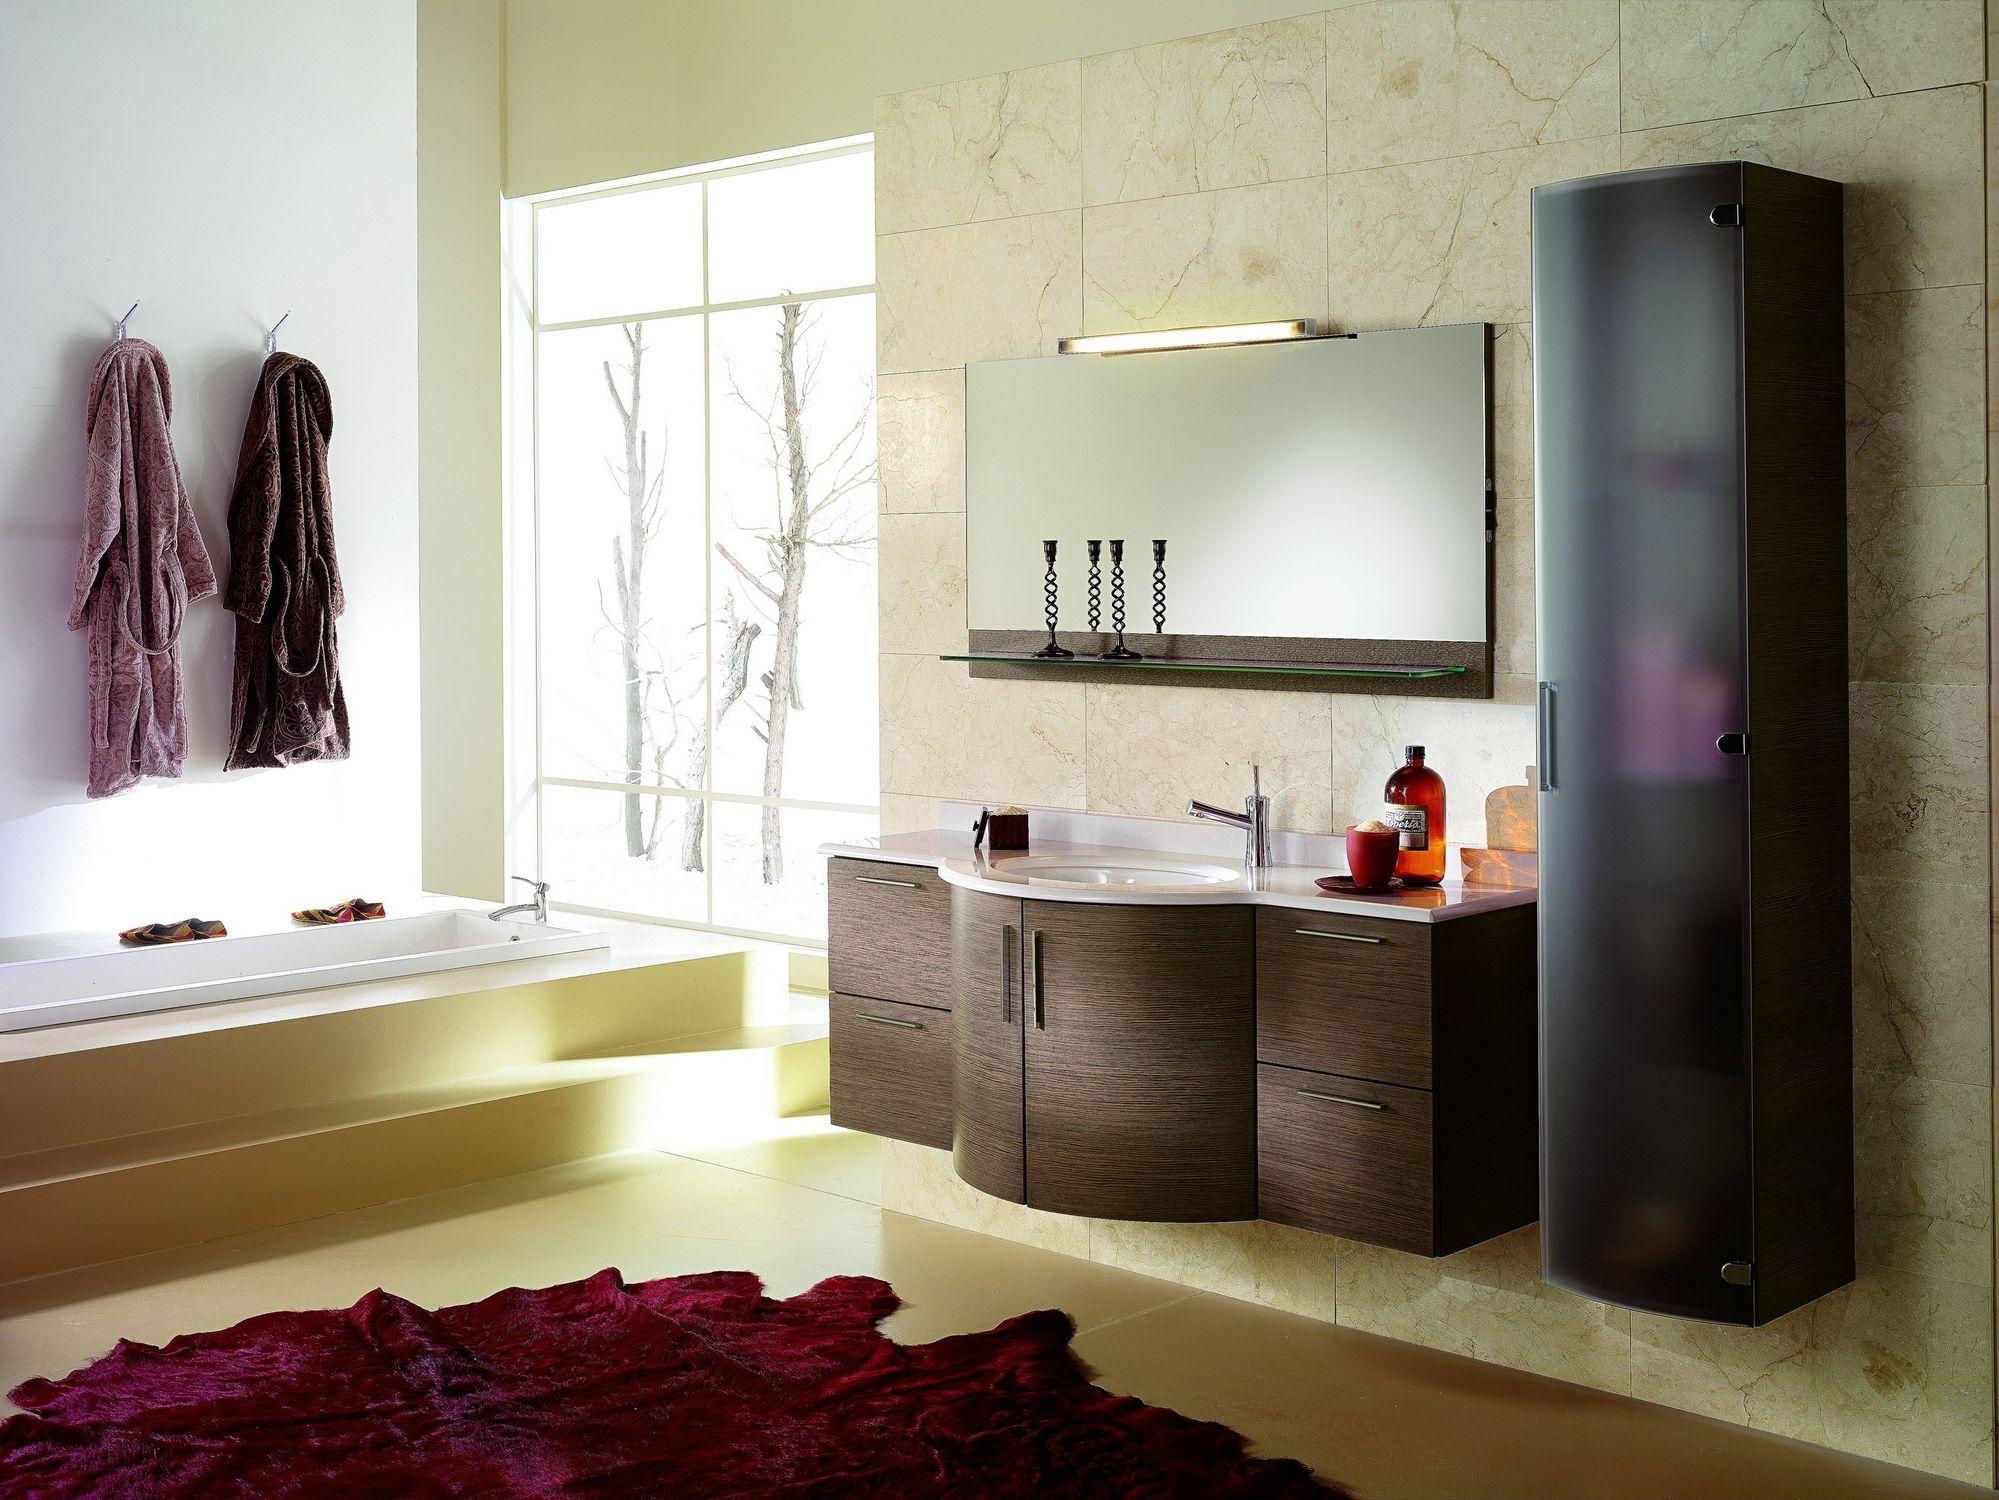 Bathroom Elegant Contemporary Bathroom With Classy Brown Tile And Amazing Designer Bathroom Cabinet Design Ideas